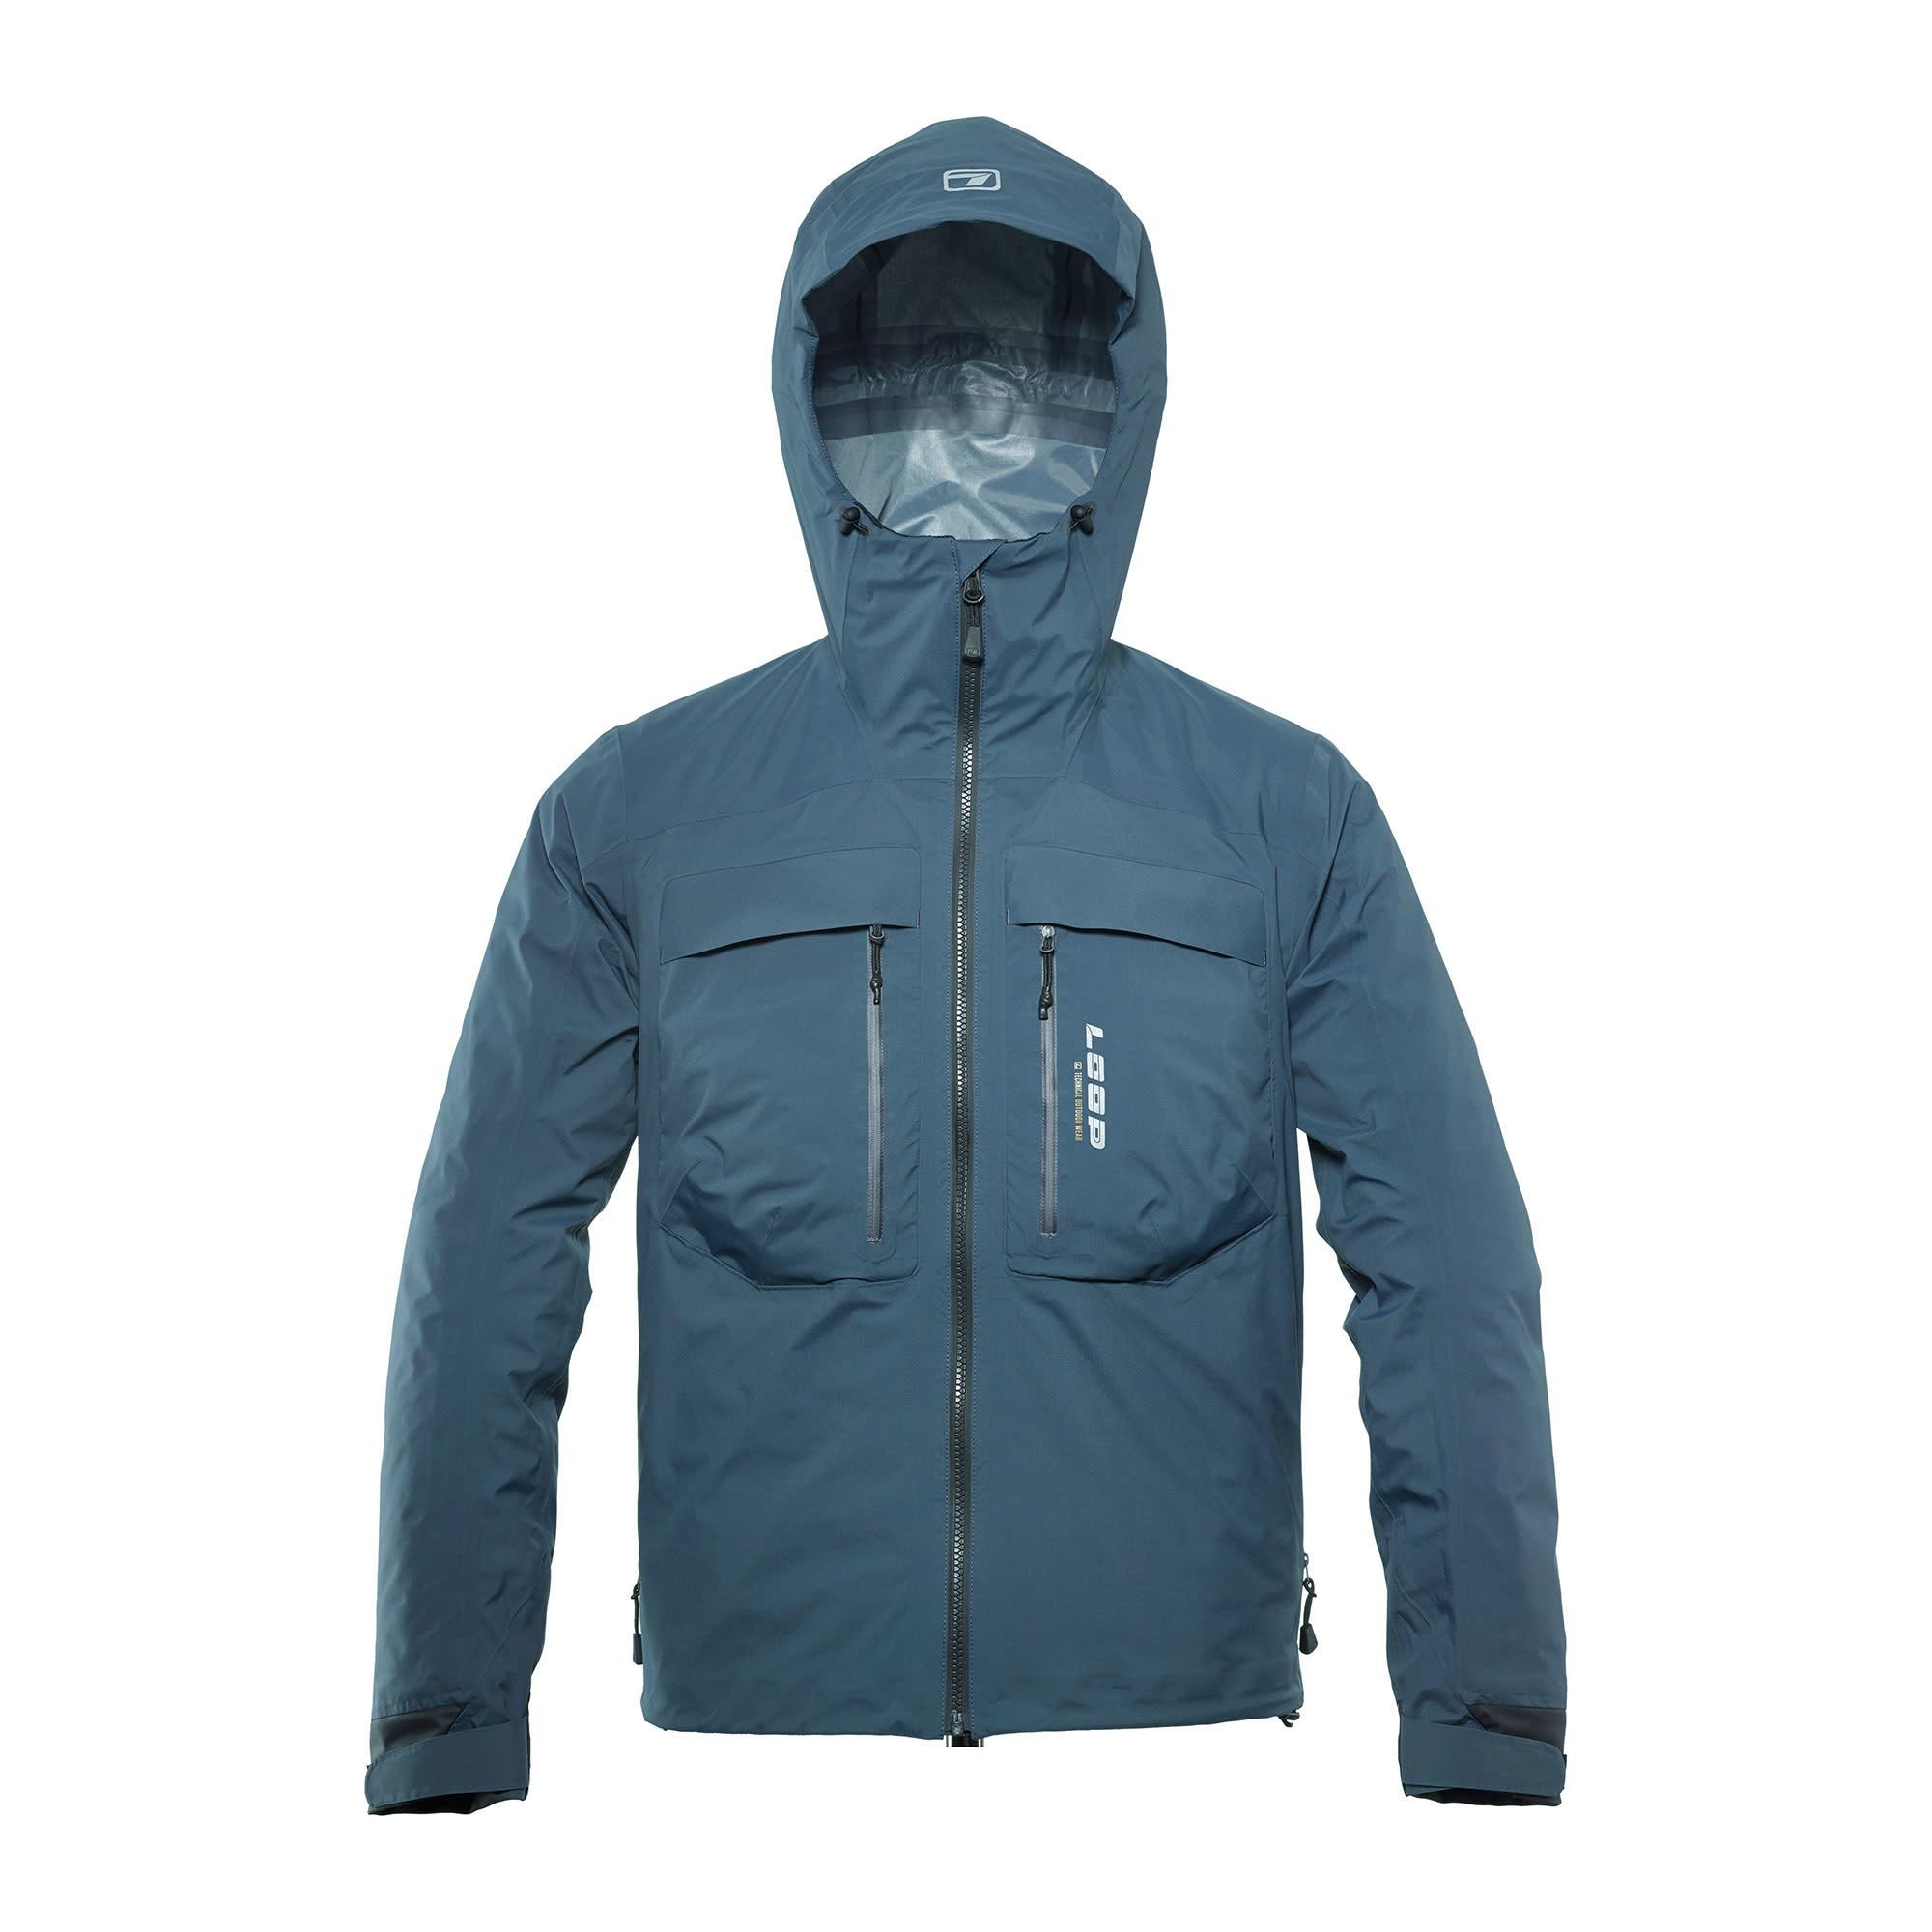 Gielas LW Jacket